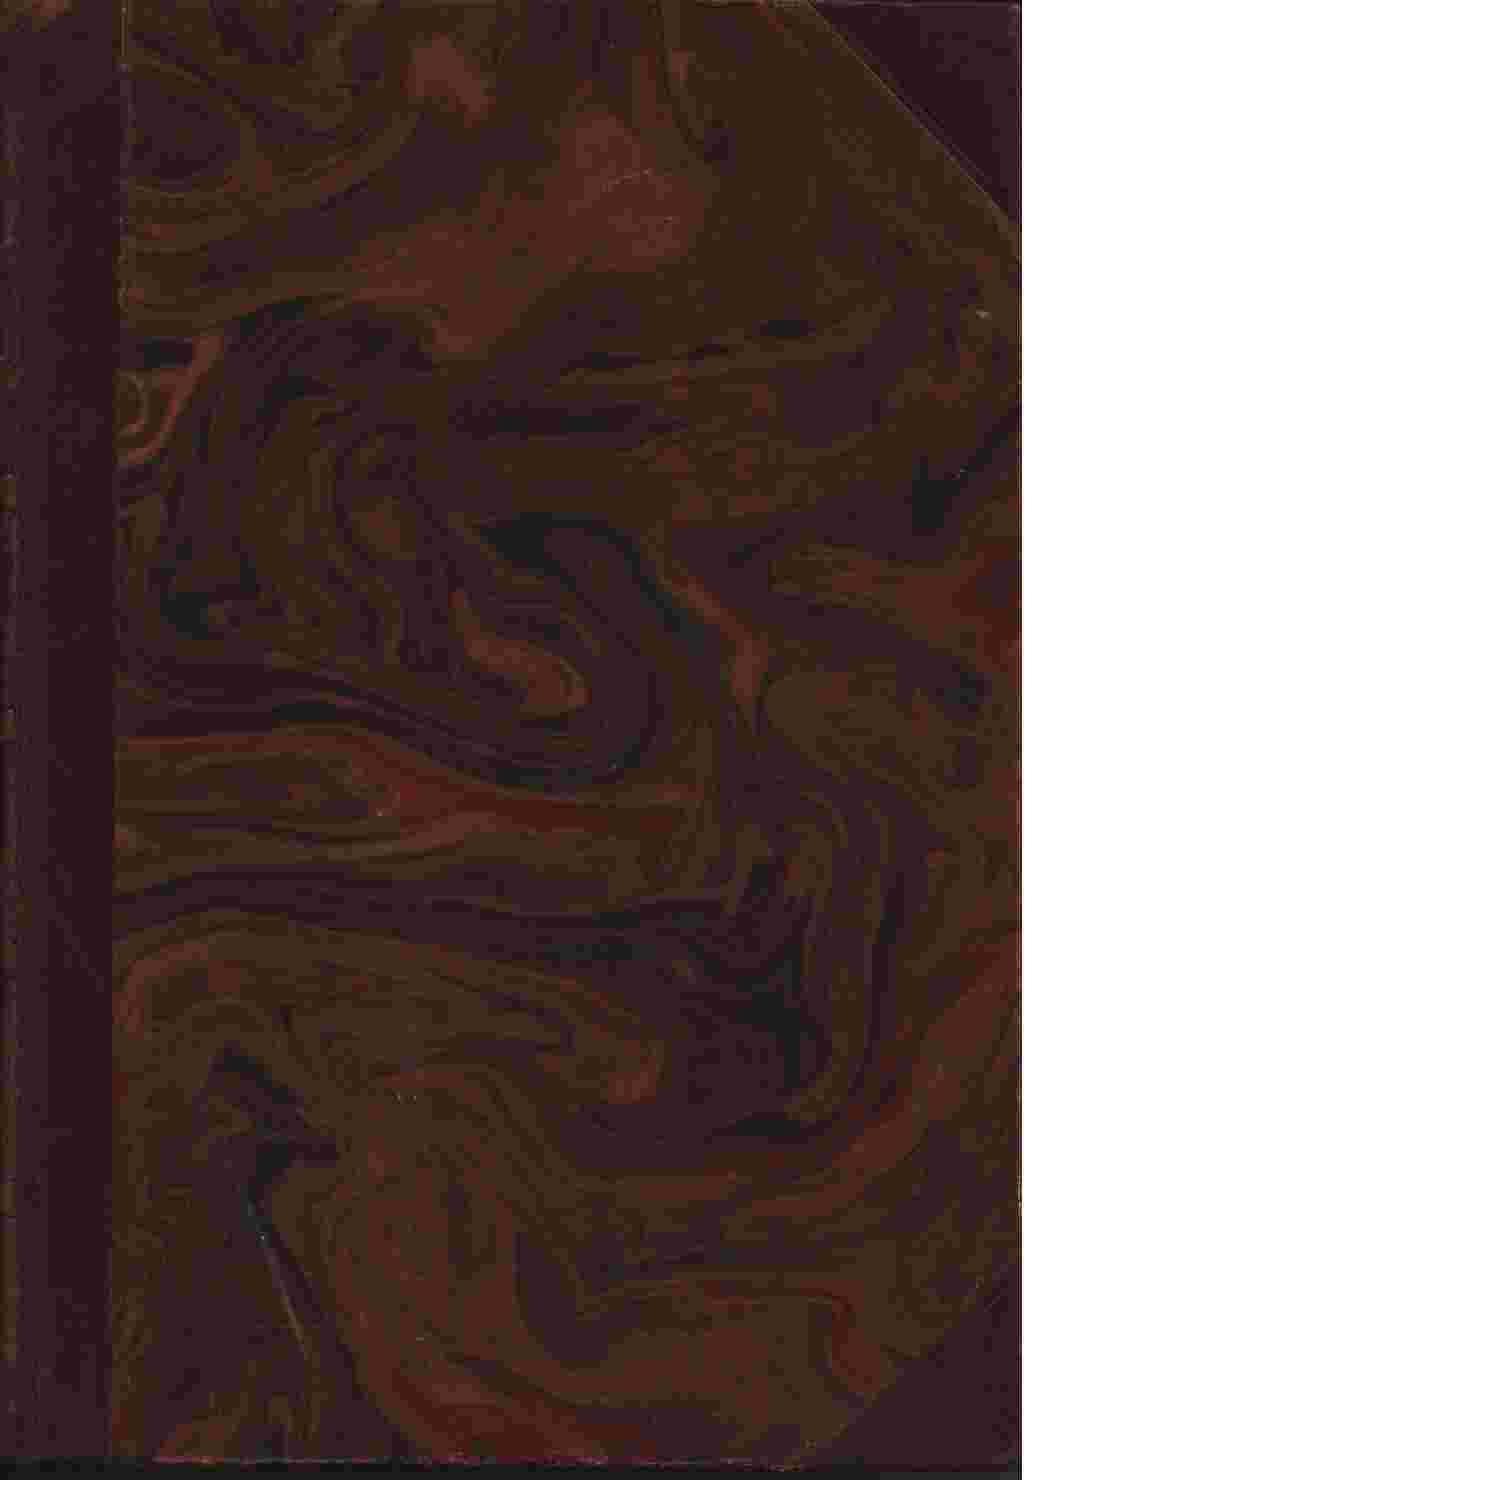 Reseskisser från Nordostafrika - Brehm, Alfred Edmund